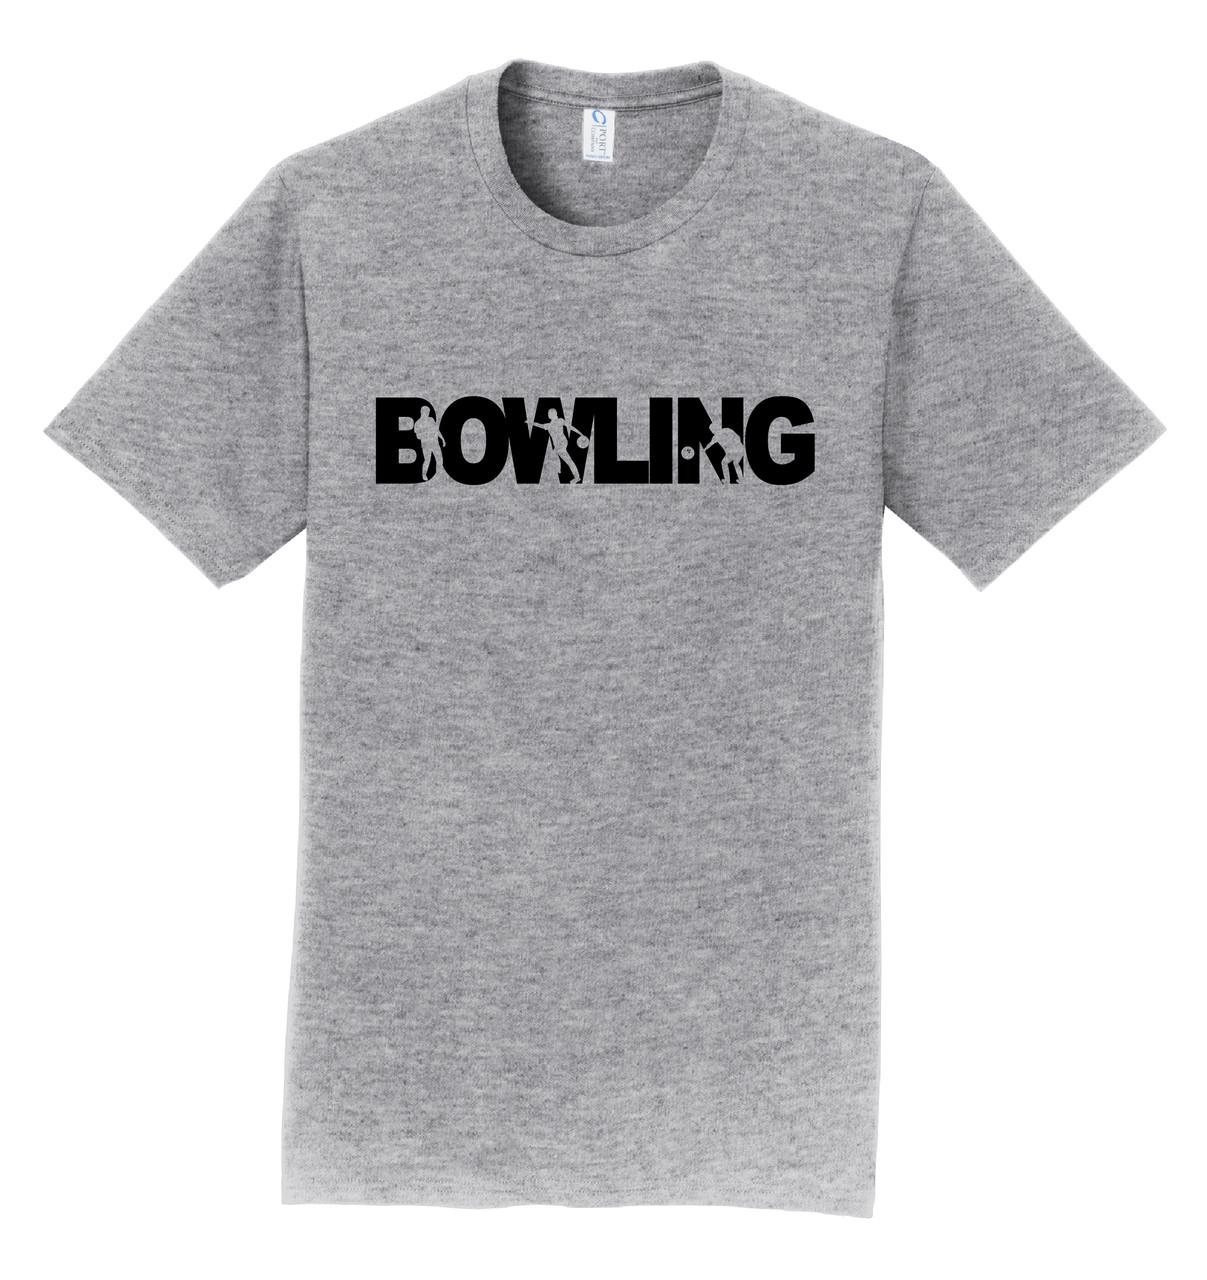 I AM Bowling T-Shirt - Bowling Black Logo - 8 Colors